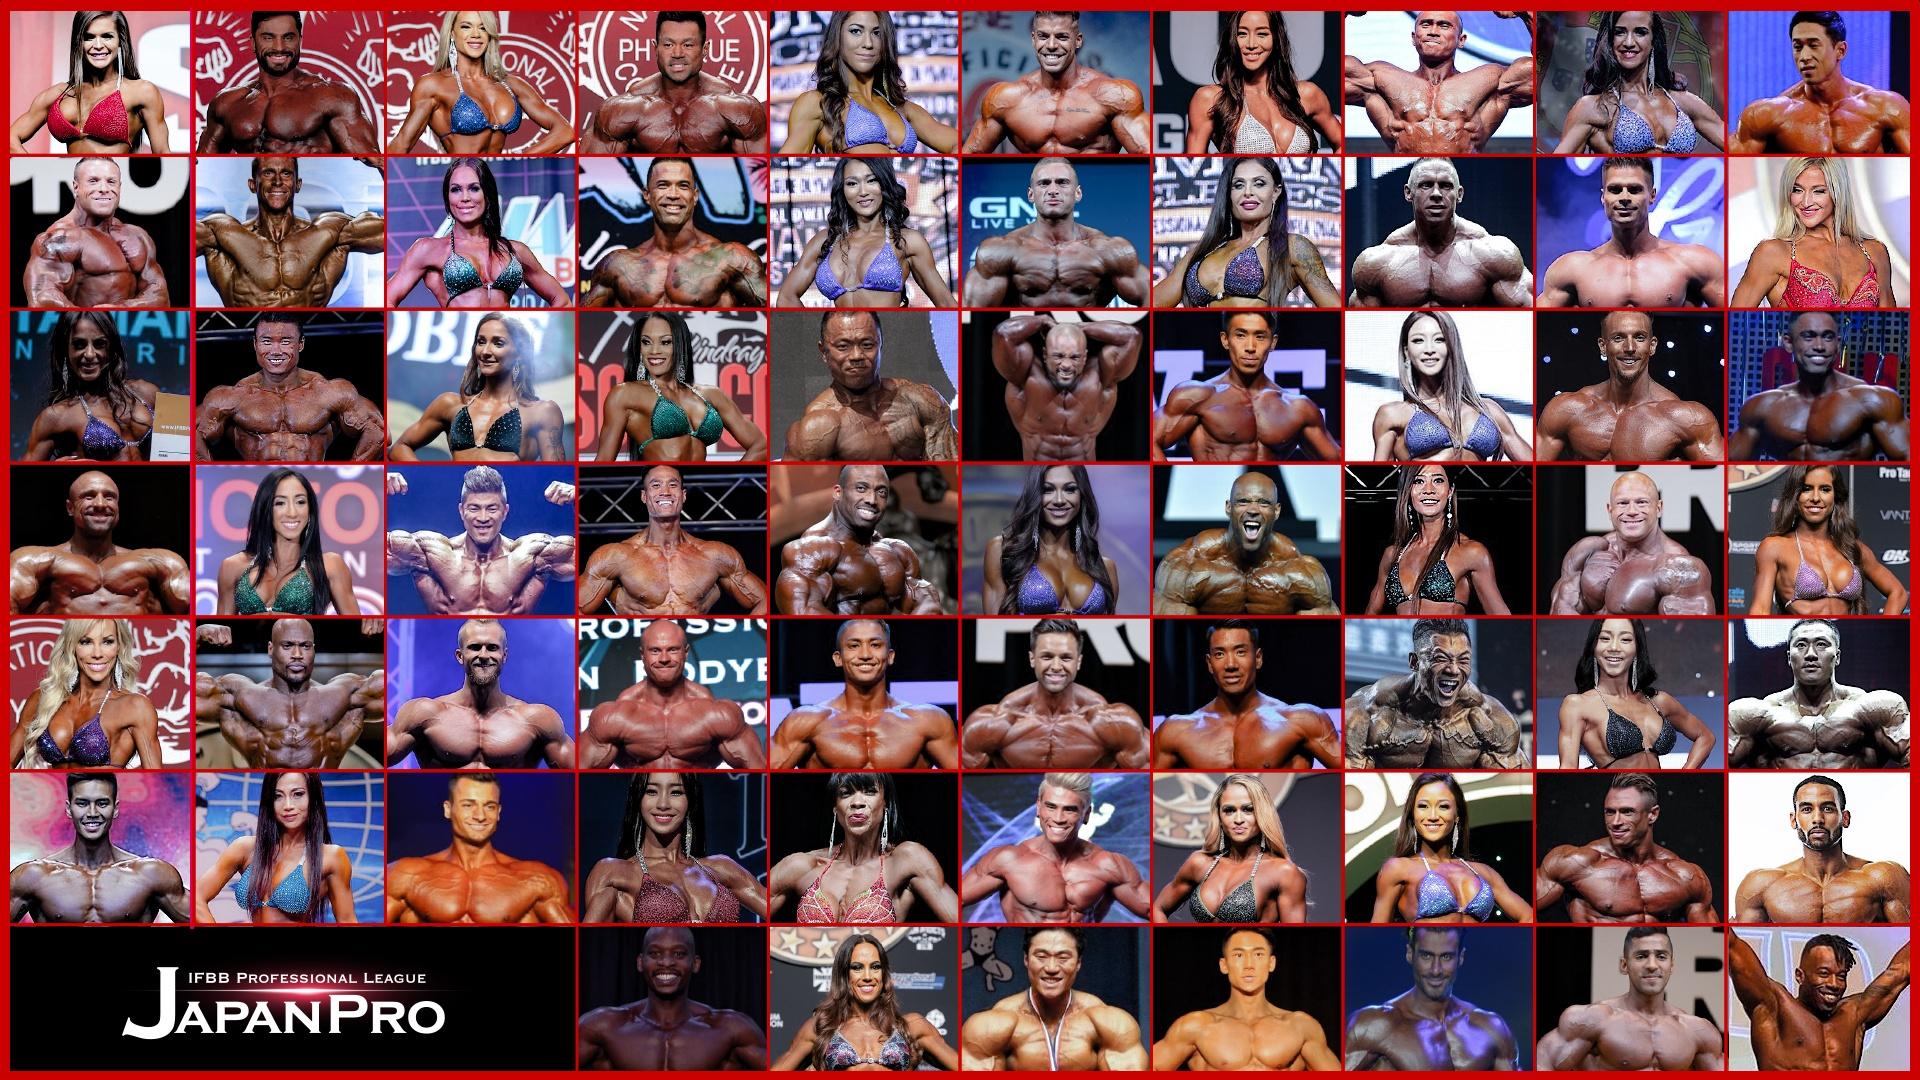 Japan Pro 2019 competitors